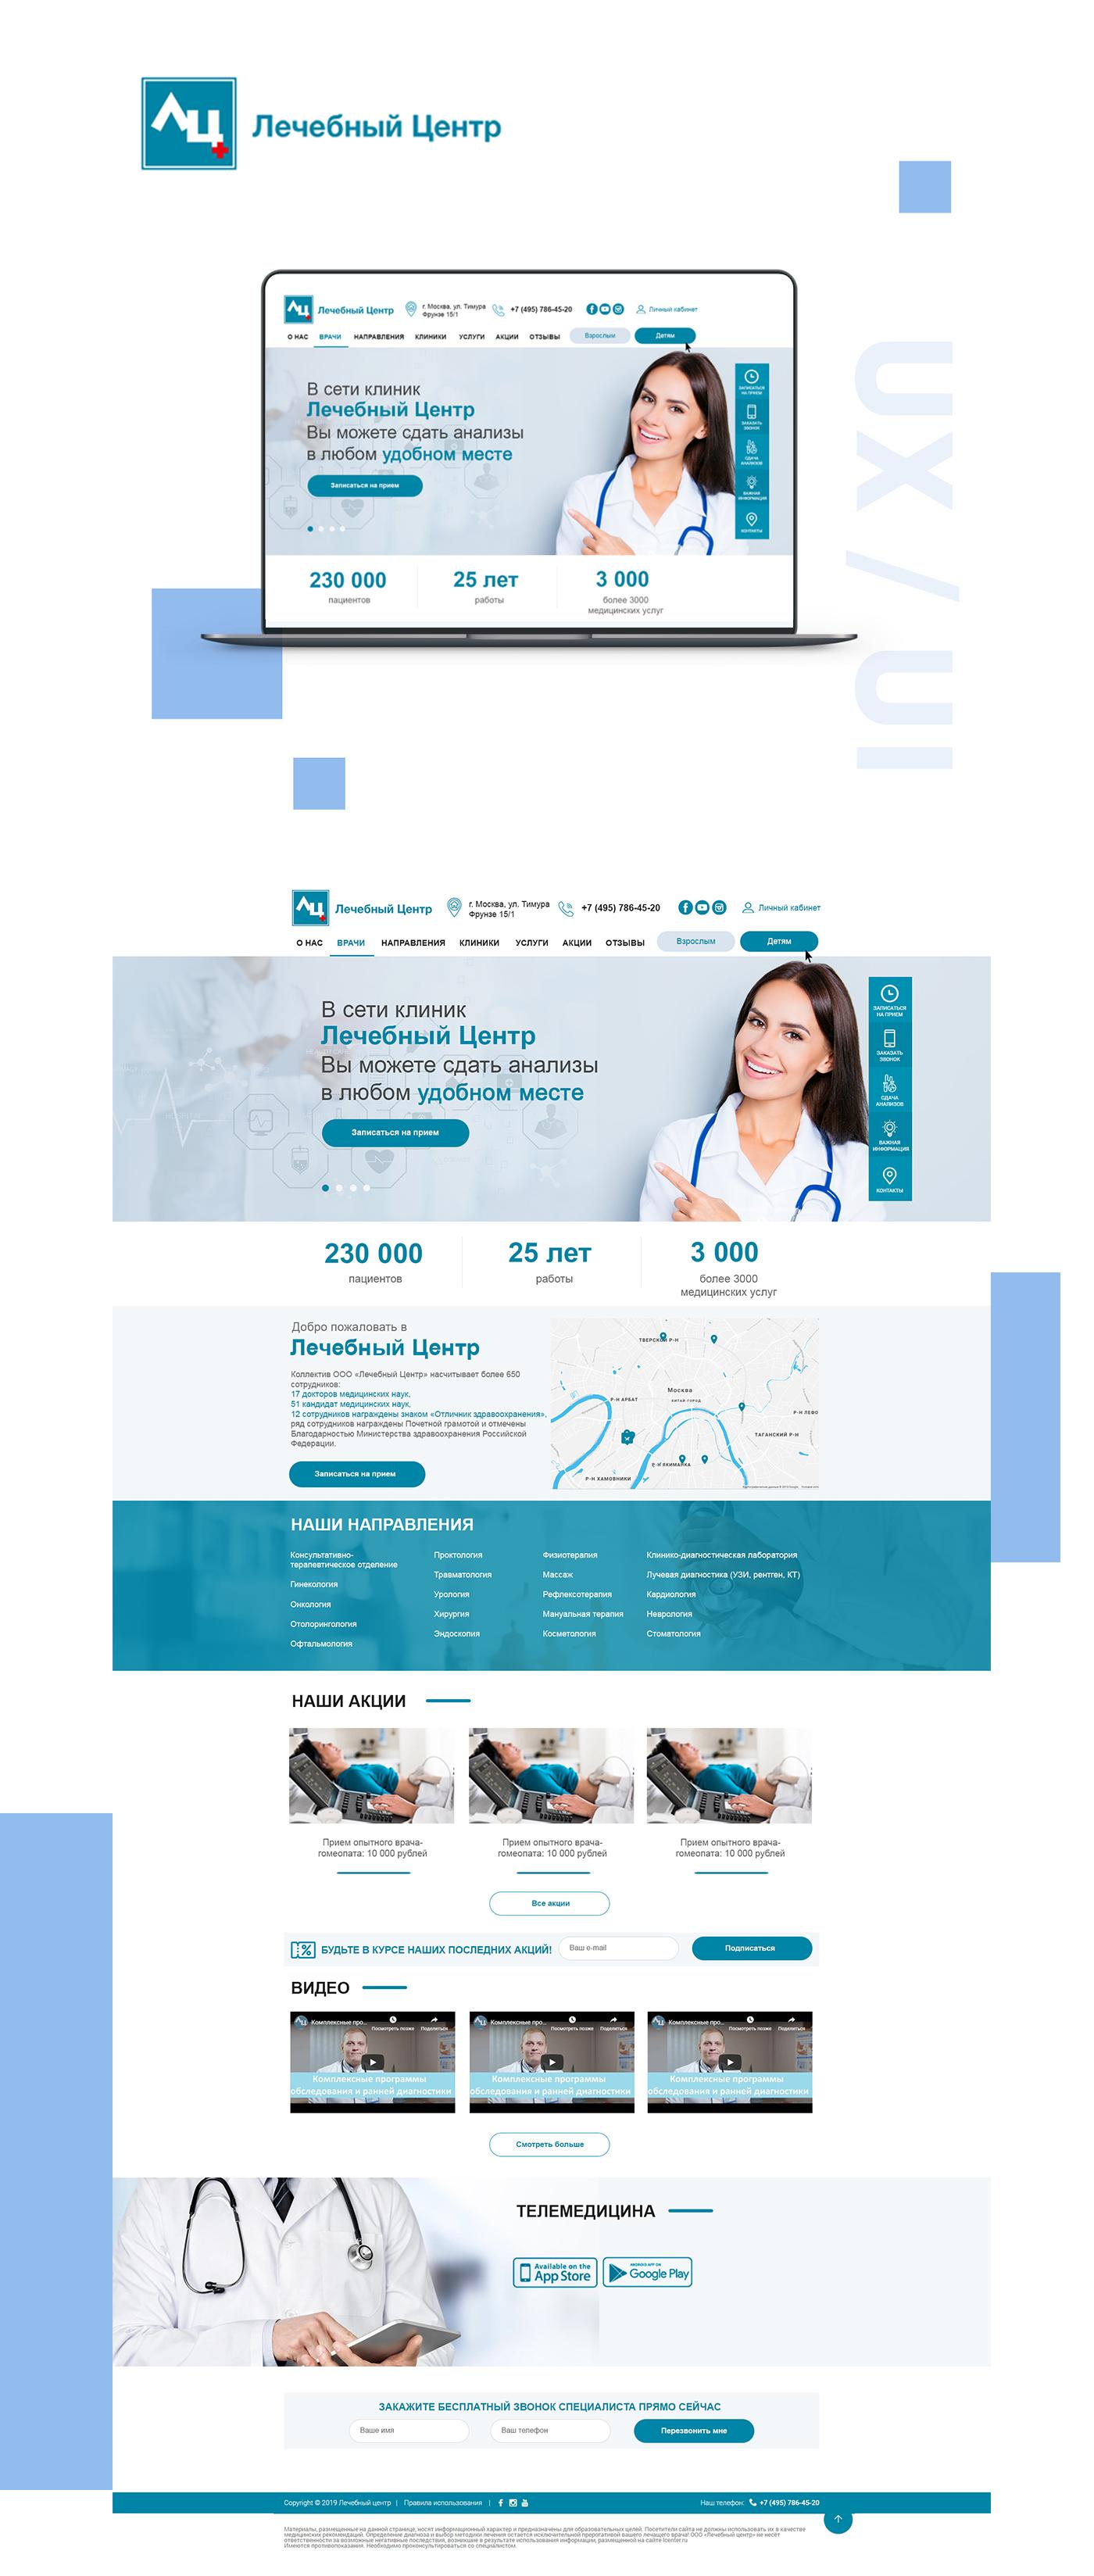 Лечебный центр дизайн сайта